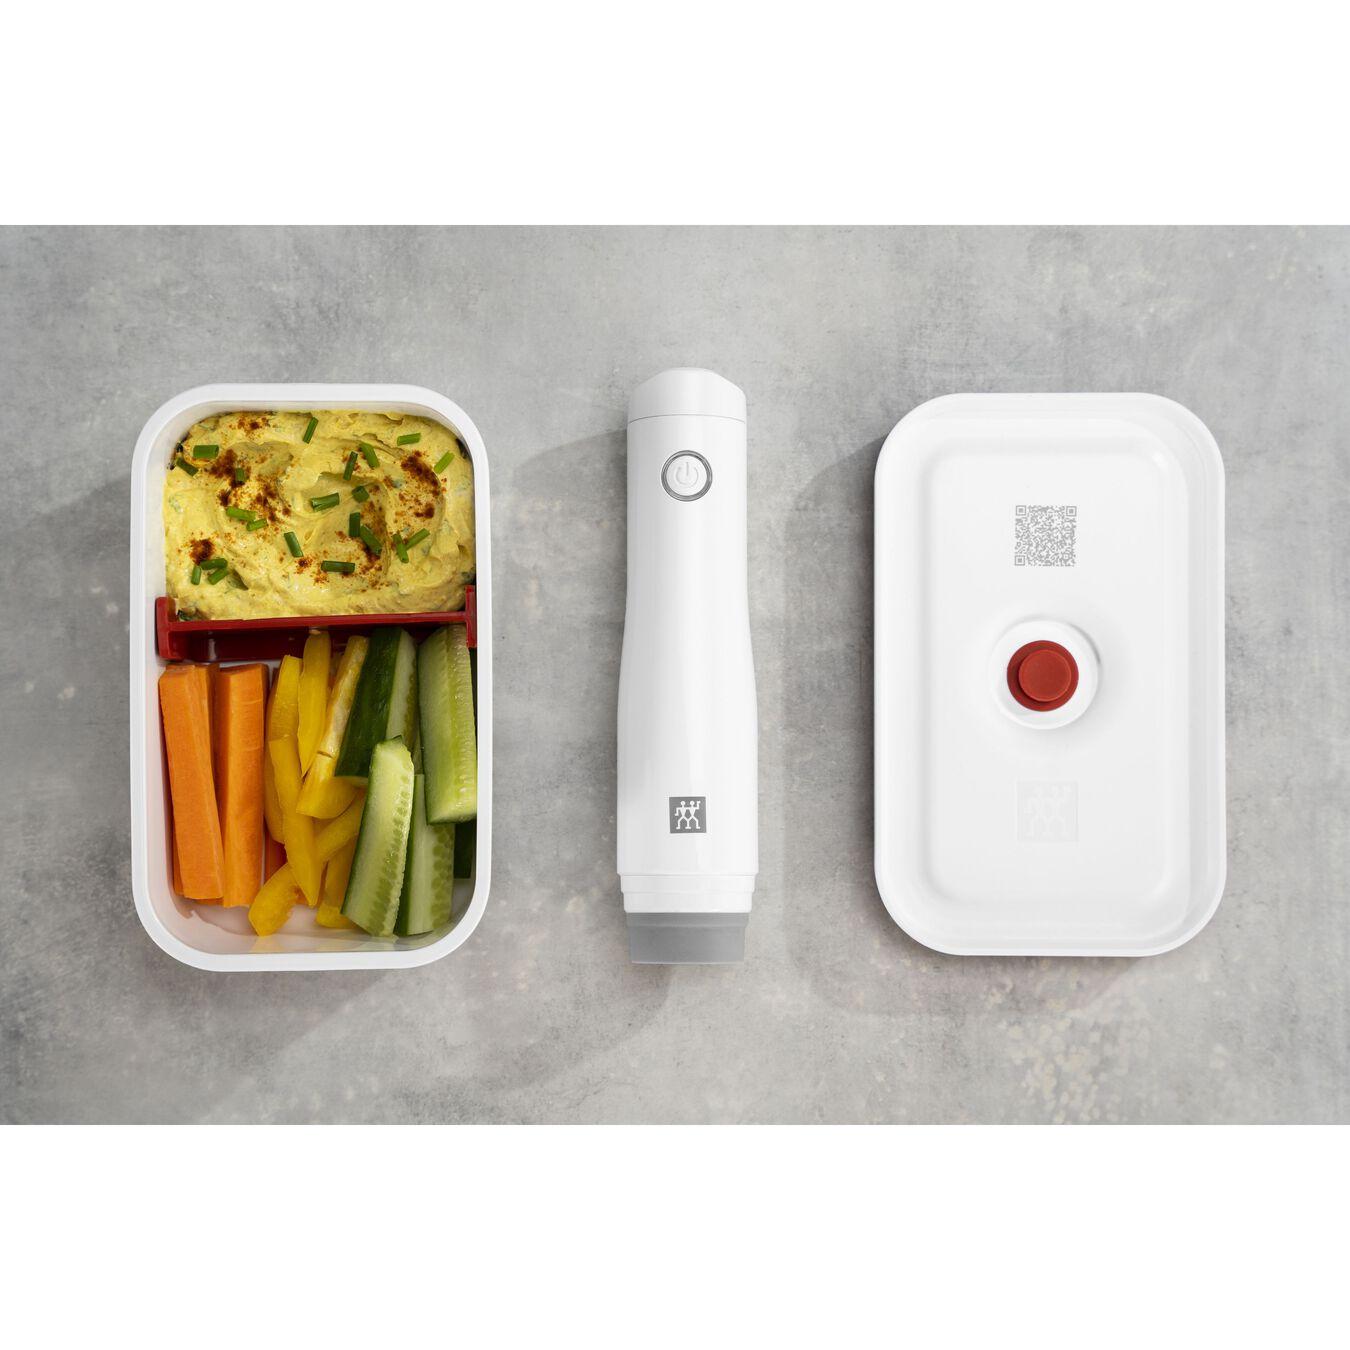 Vakuum Lunchbox, M, Kunststoff, Weiß-Rot,,large 7